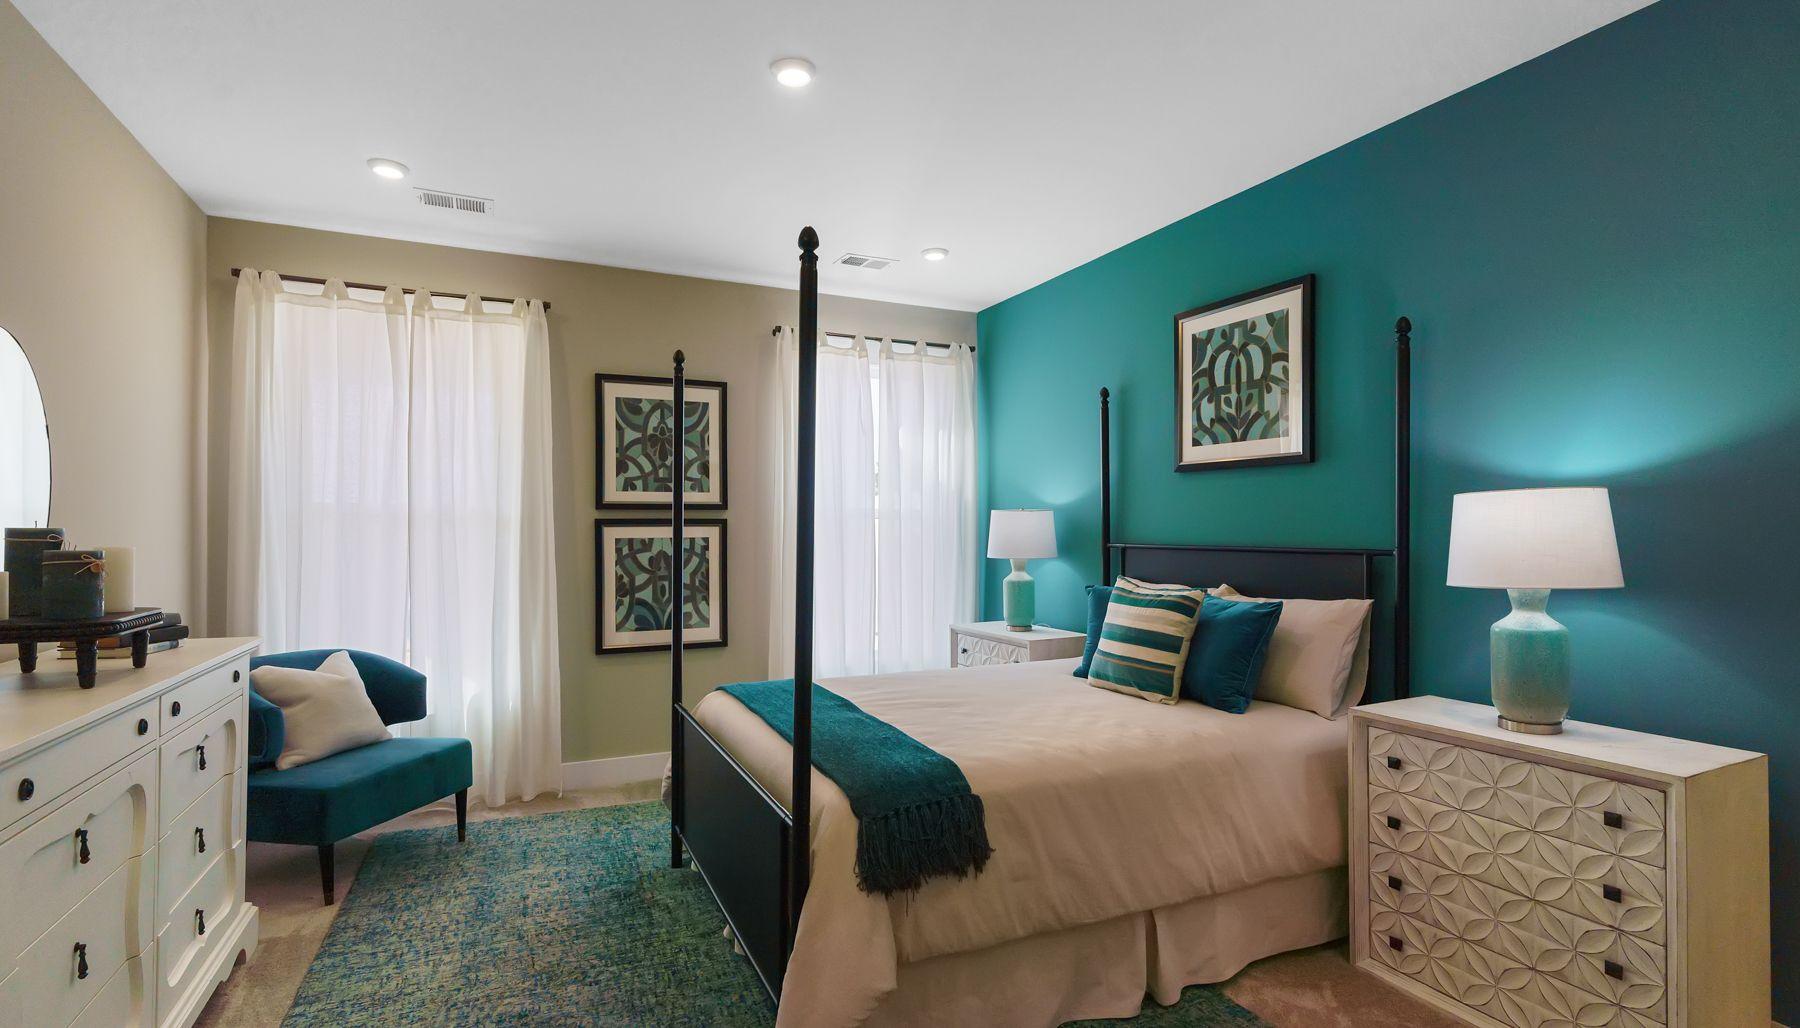 Bedroom featured in the Summit By Dan Ryan Builders in Greenville-Spartanburg, SC